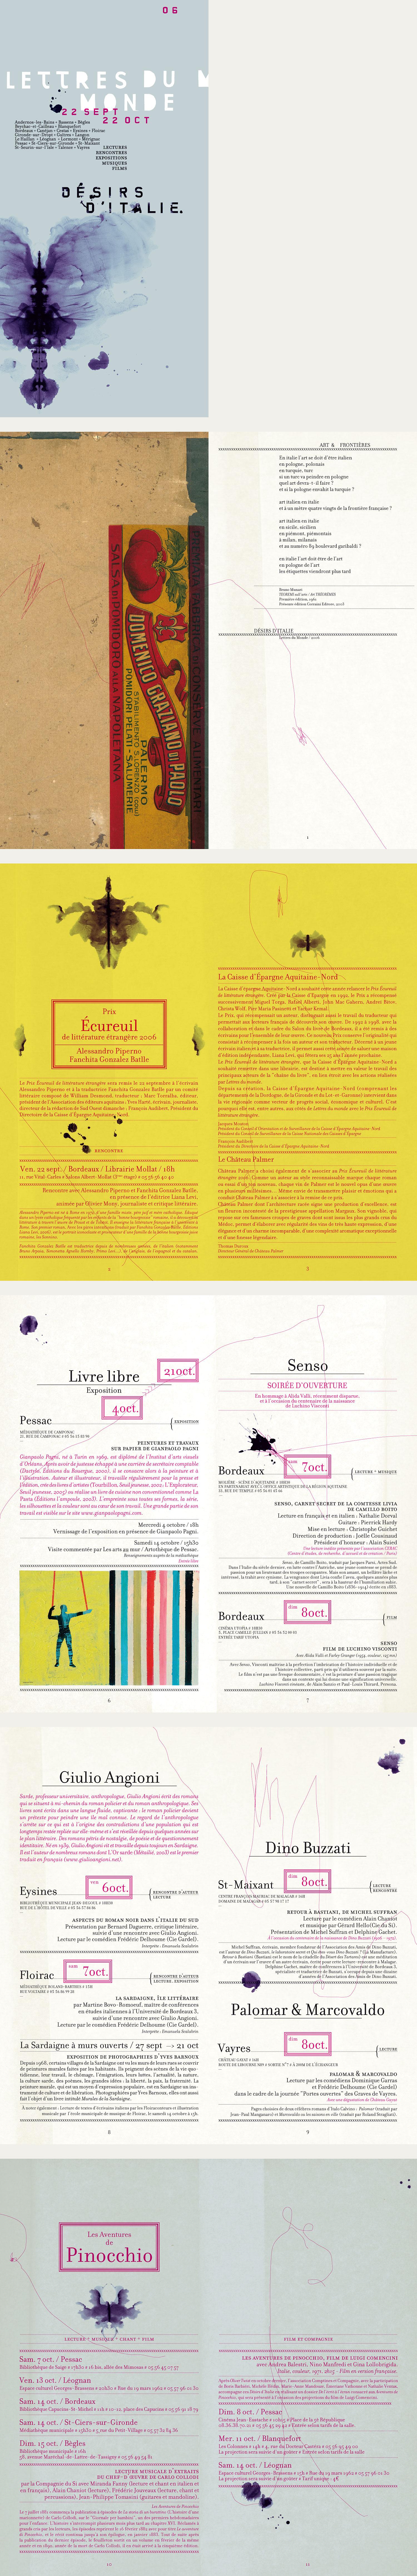 MrThornill-graphisme-lettresmonde-desirs-italie-2006-ph2